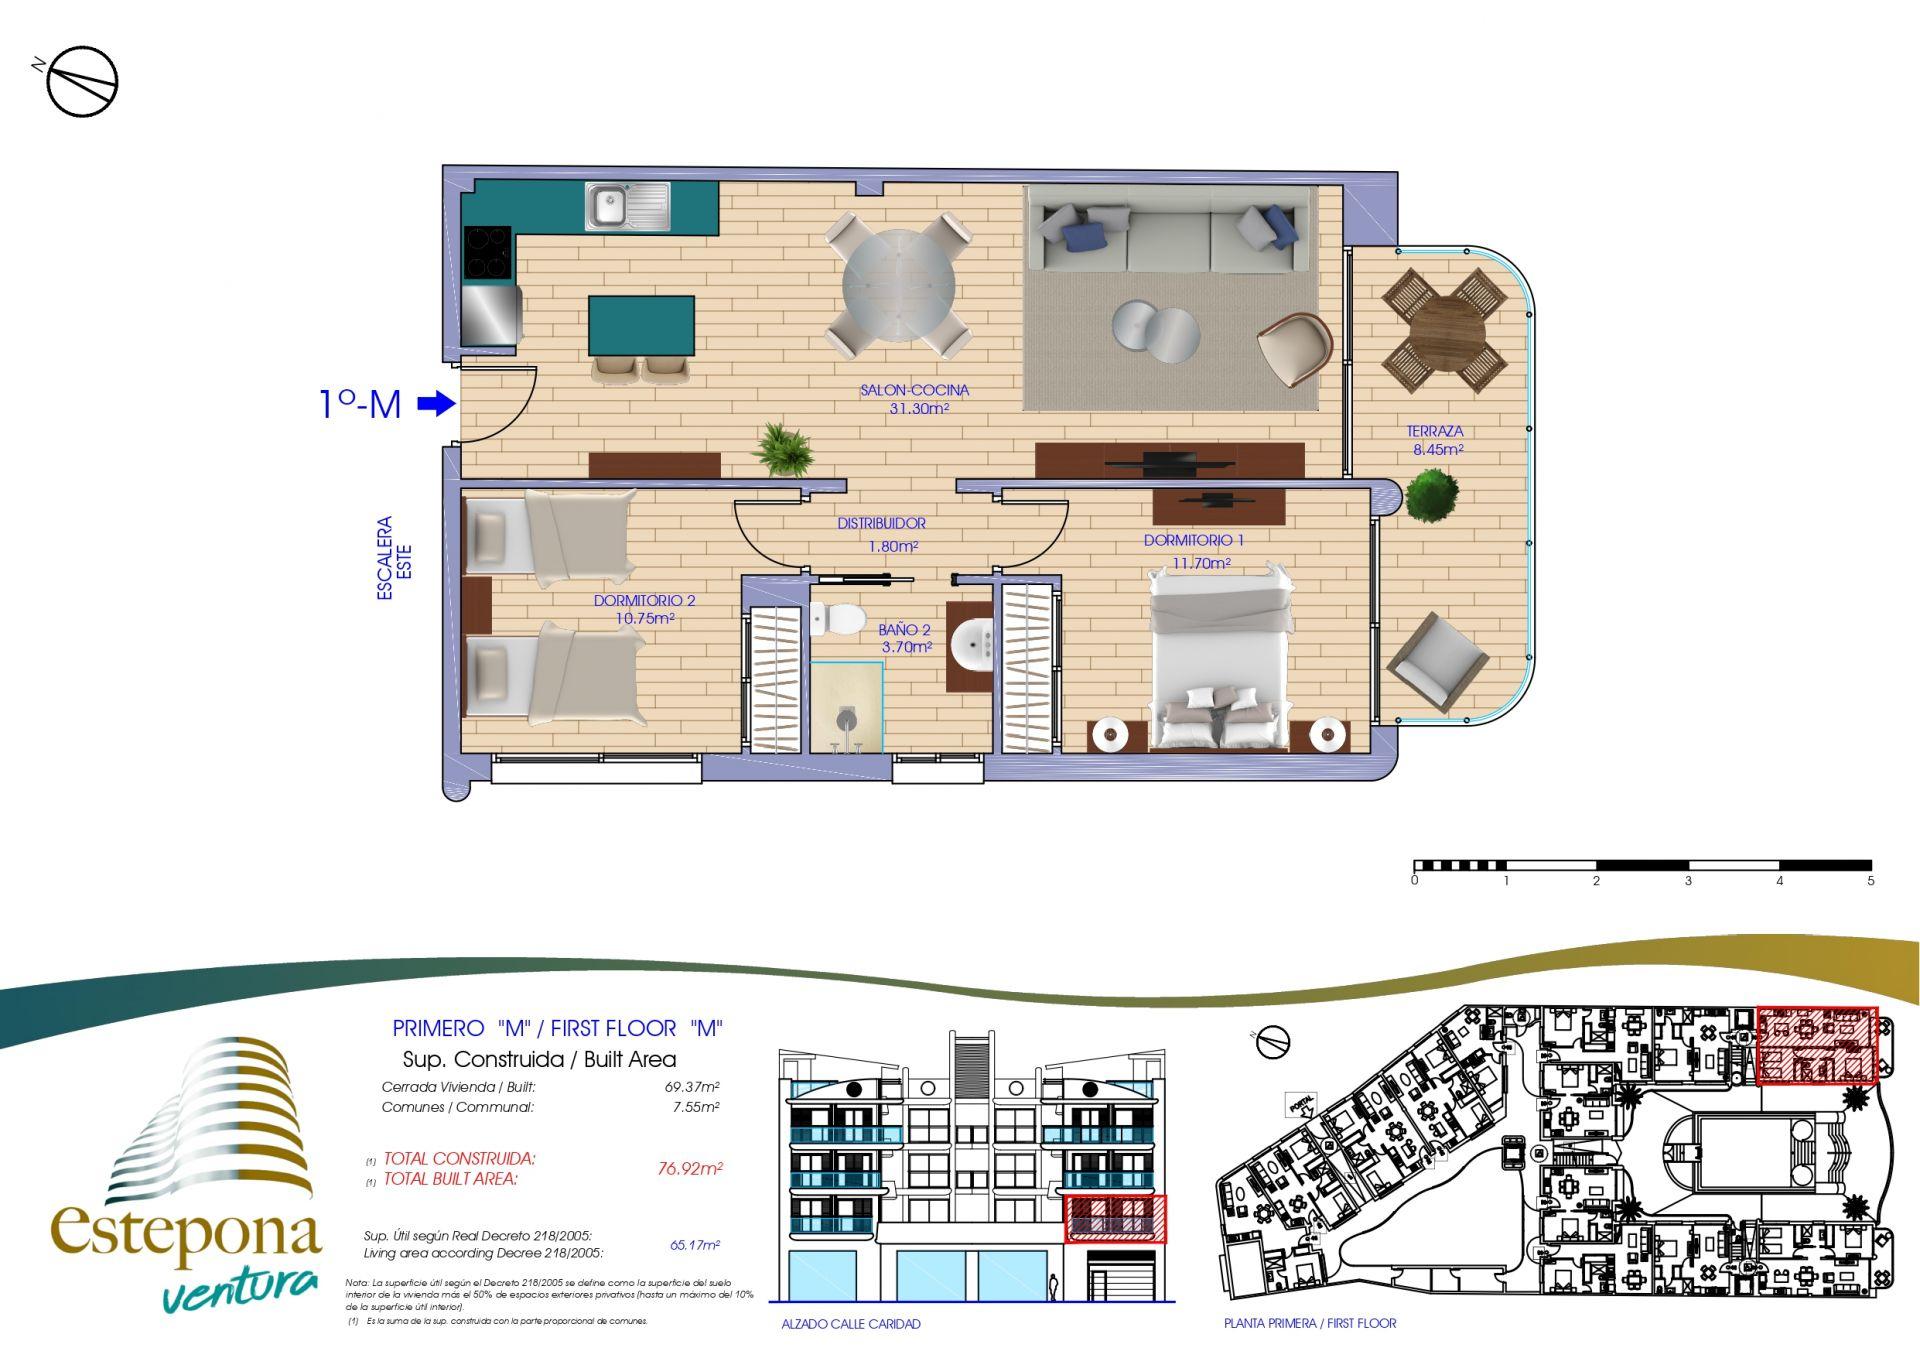 1m - Ventura Estepona | Compra de casa en Estepona